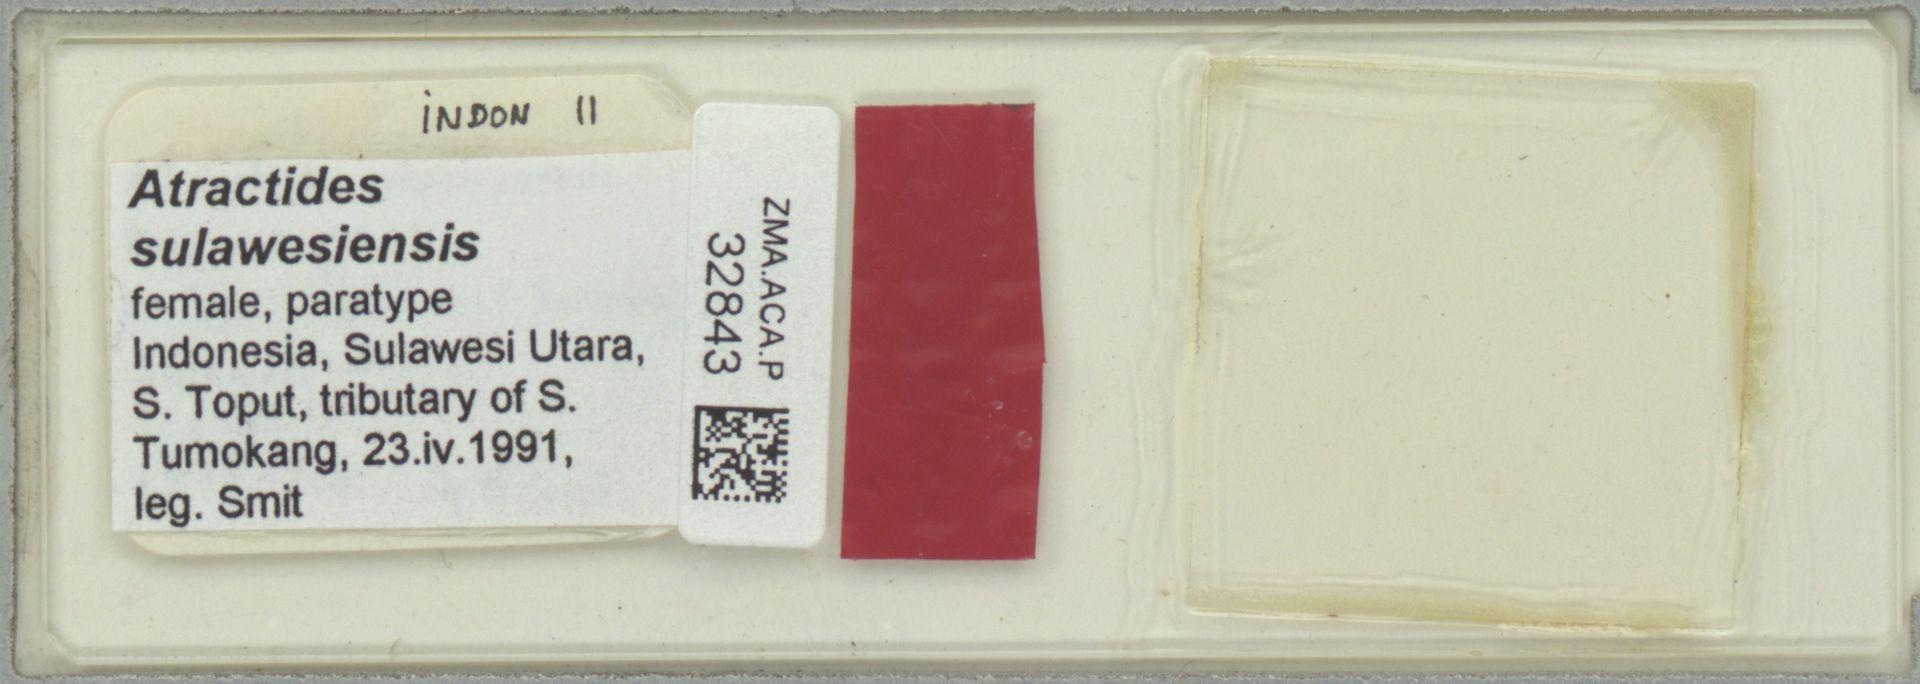 ZMA.ACA.P.32843 | Atractides sulawesiensis Smit & Pesic, 2009